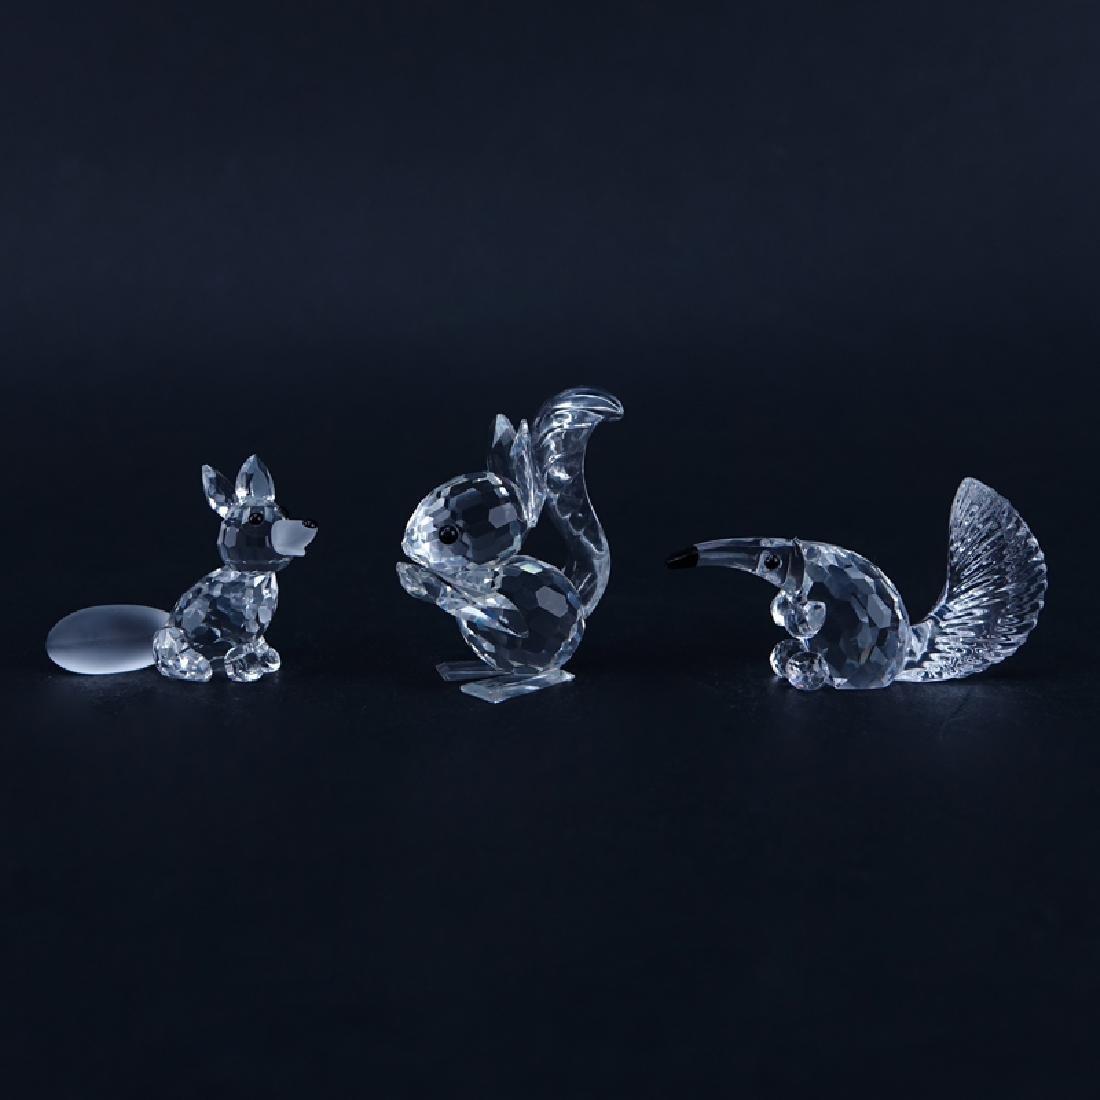 Three (3) Swarovski Crystal Animal Figurines in